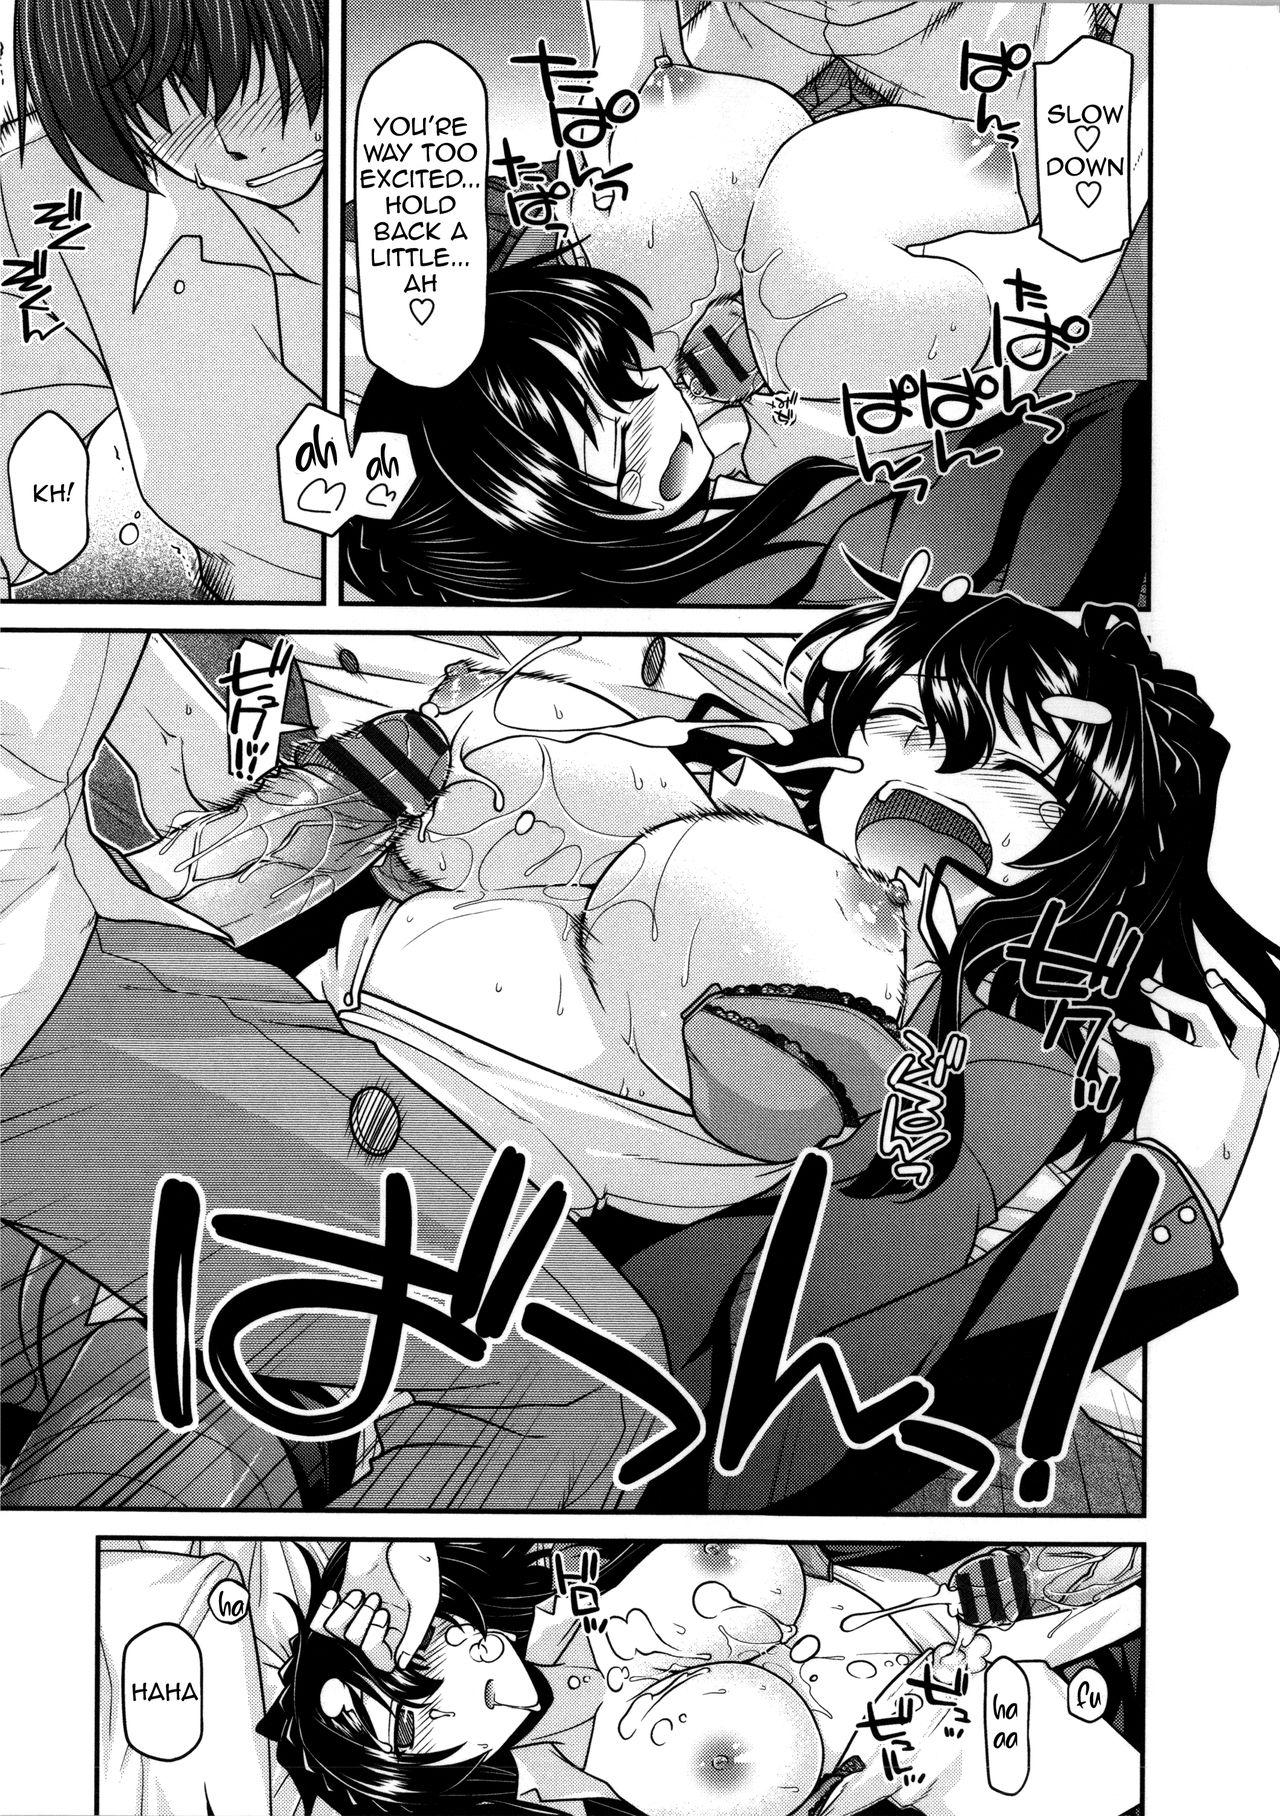 [Miyashiro Sousuke] Yamato Nadeshiko Chichi Henge - Yamato Nadeshiko Breast Changes Ch. 0-1, 4-5, 7-9 [English] 77